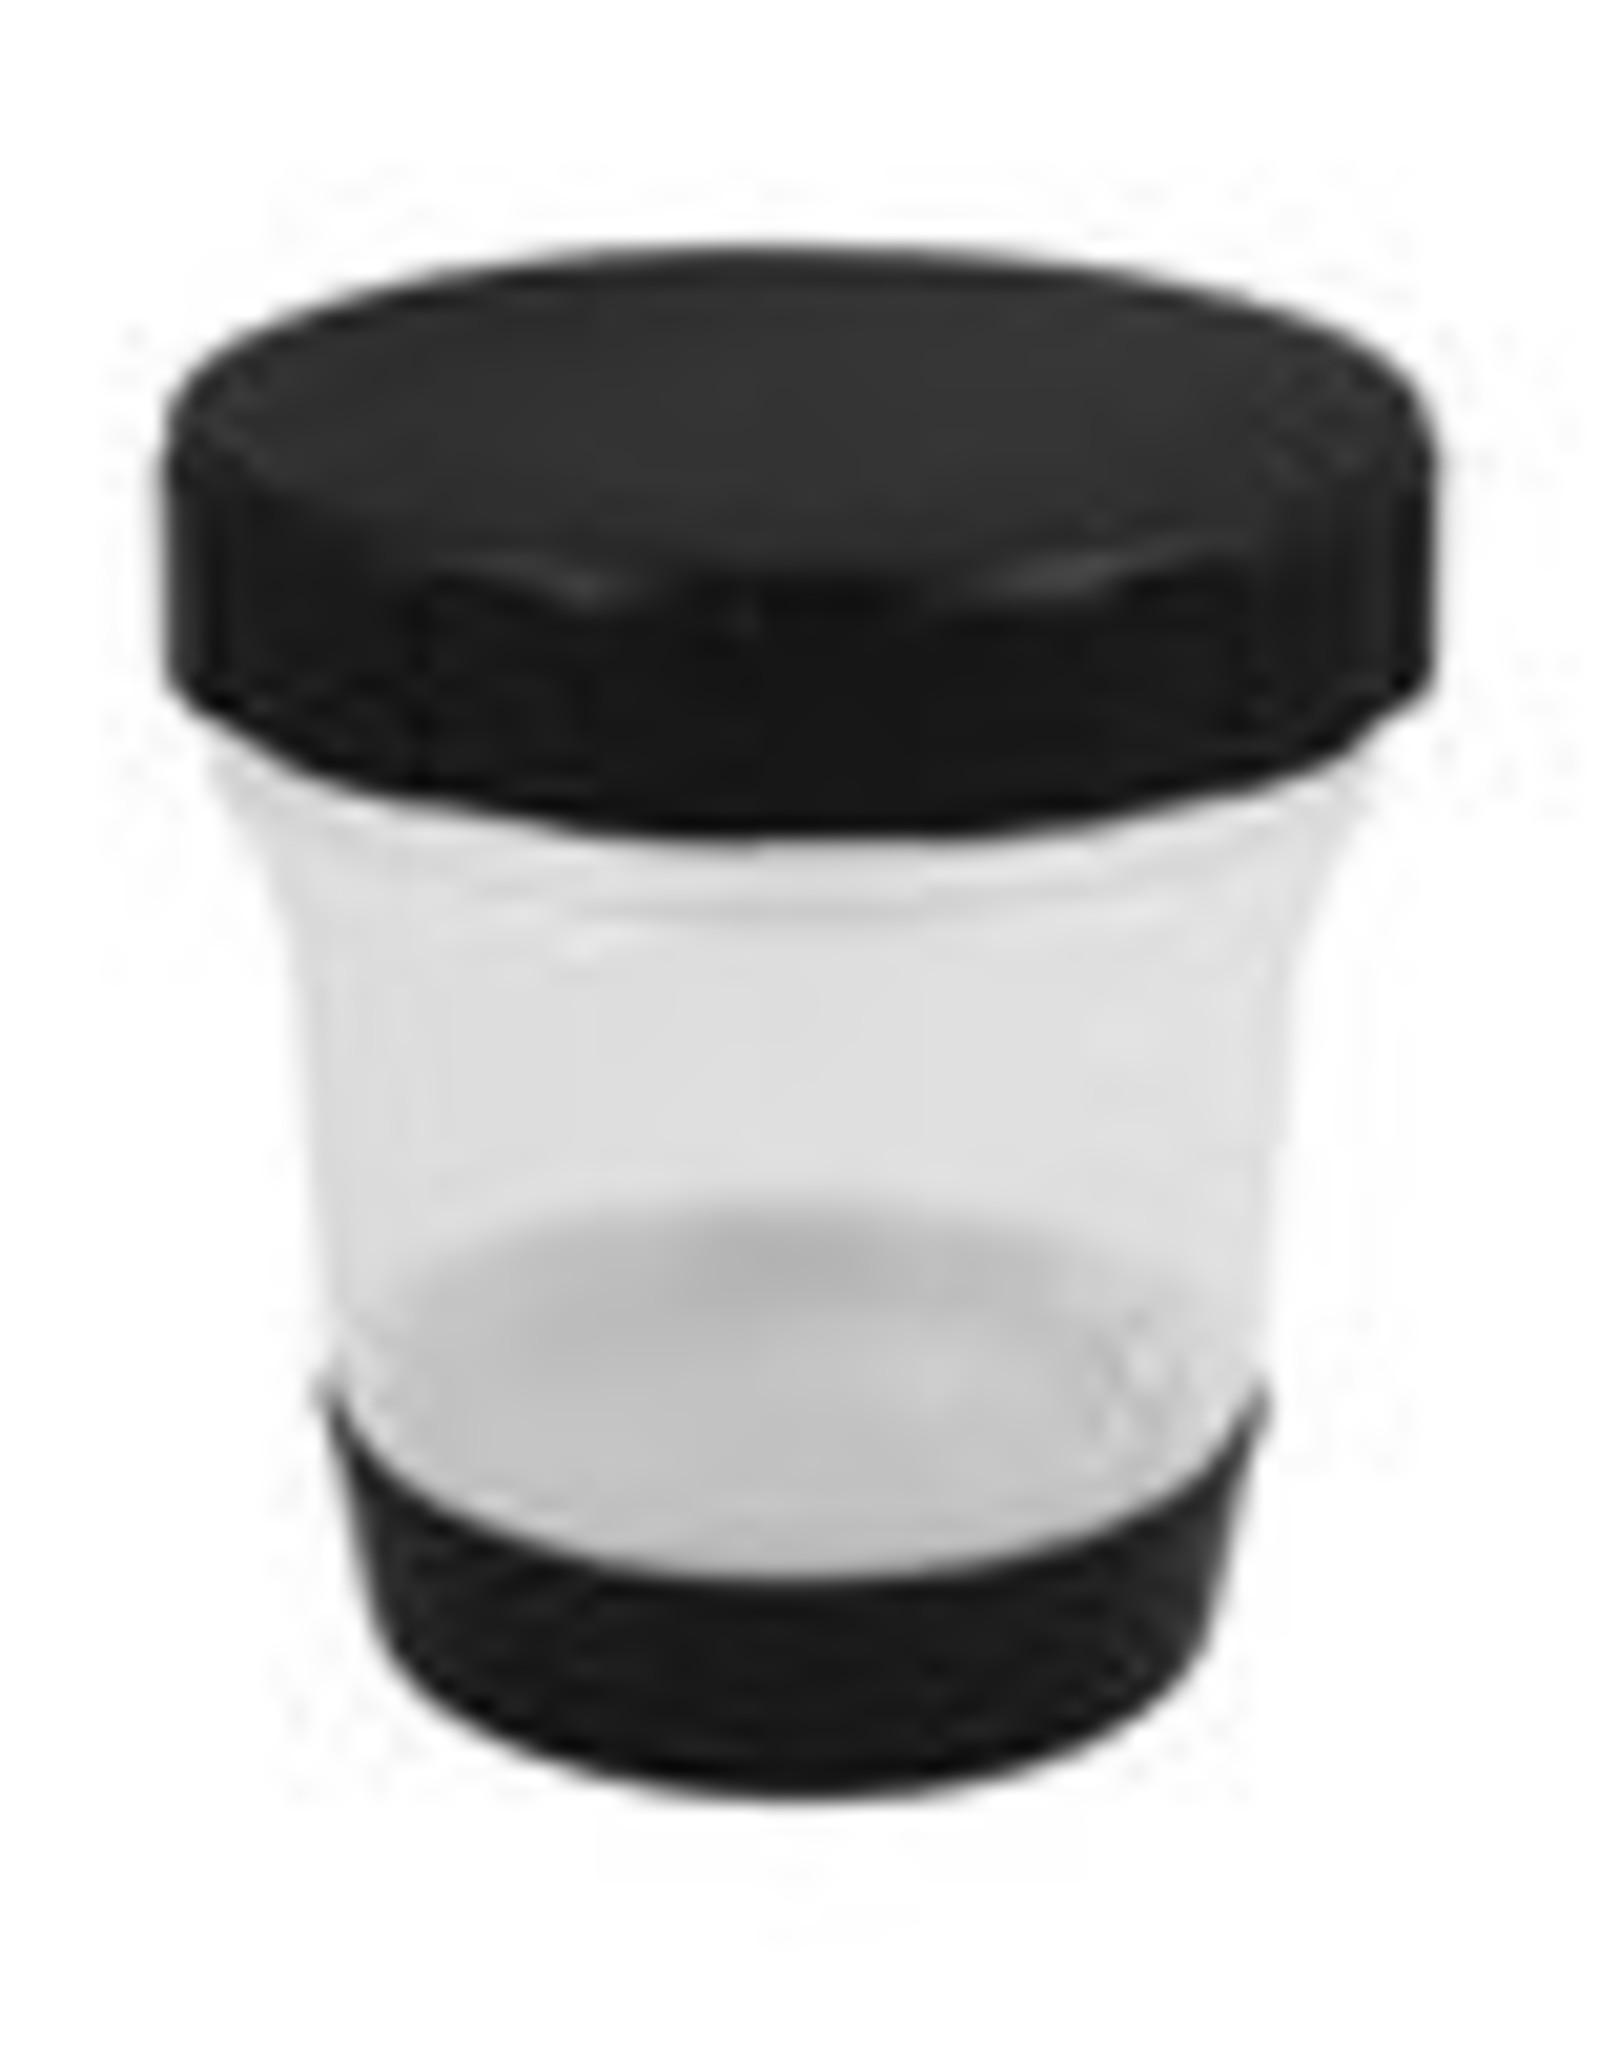 MaxiMist Aura Allure 200ml cups